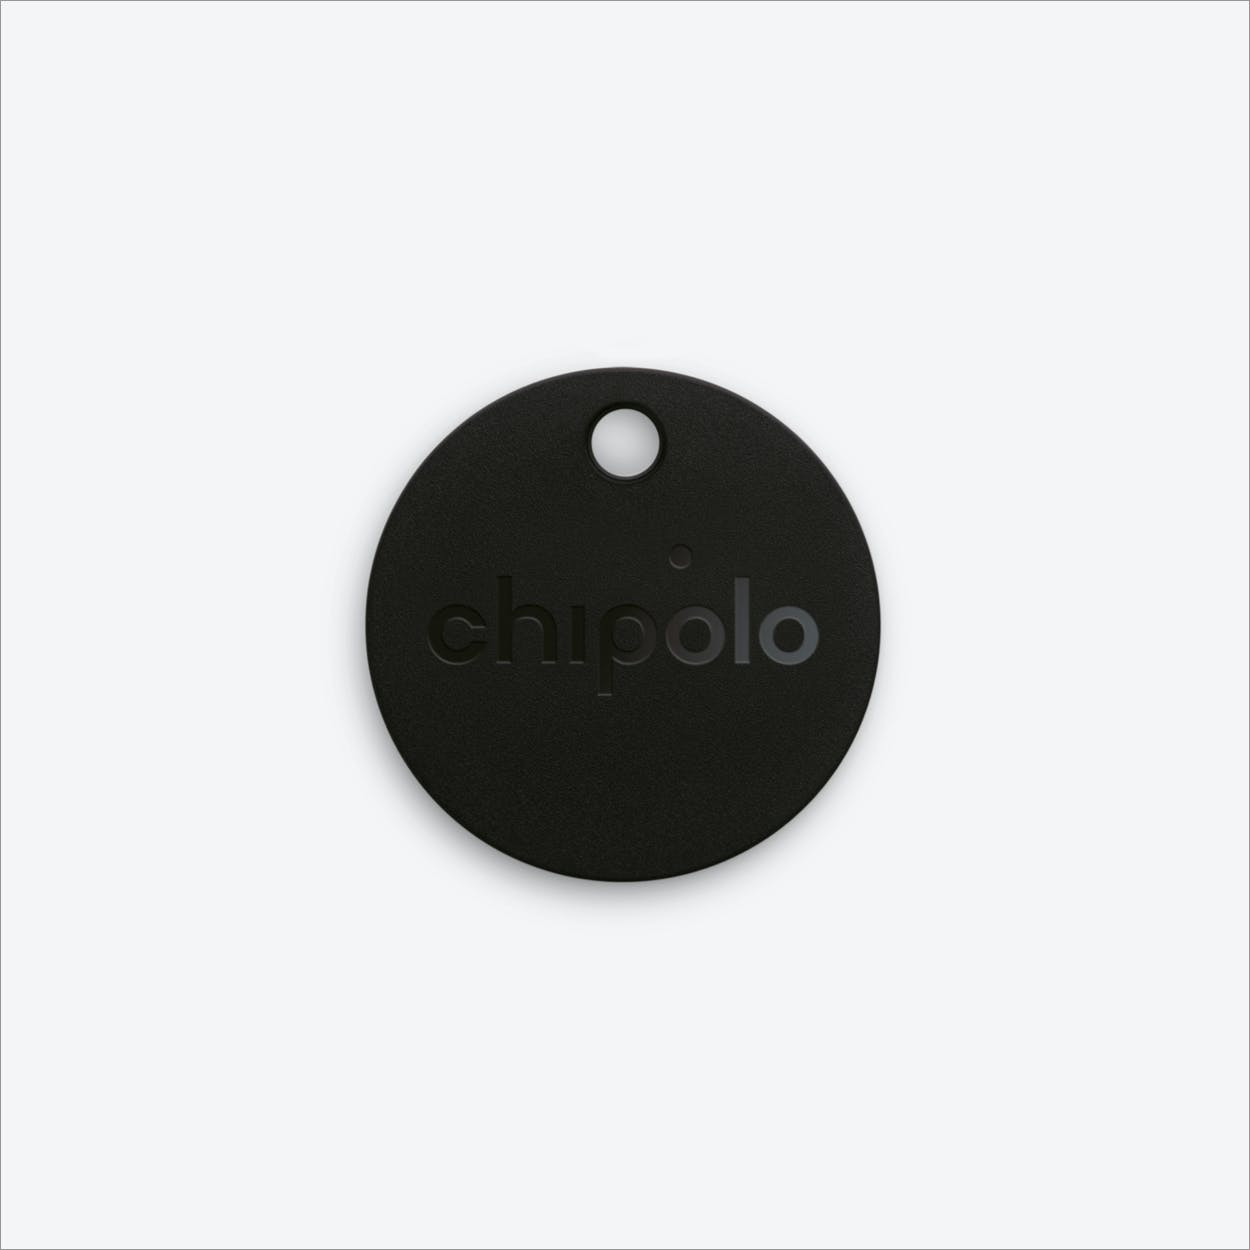 Chipolo Plus 2nd GEN BLACK